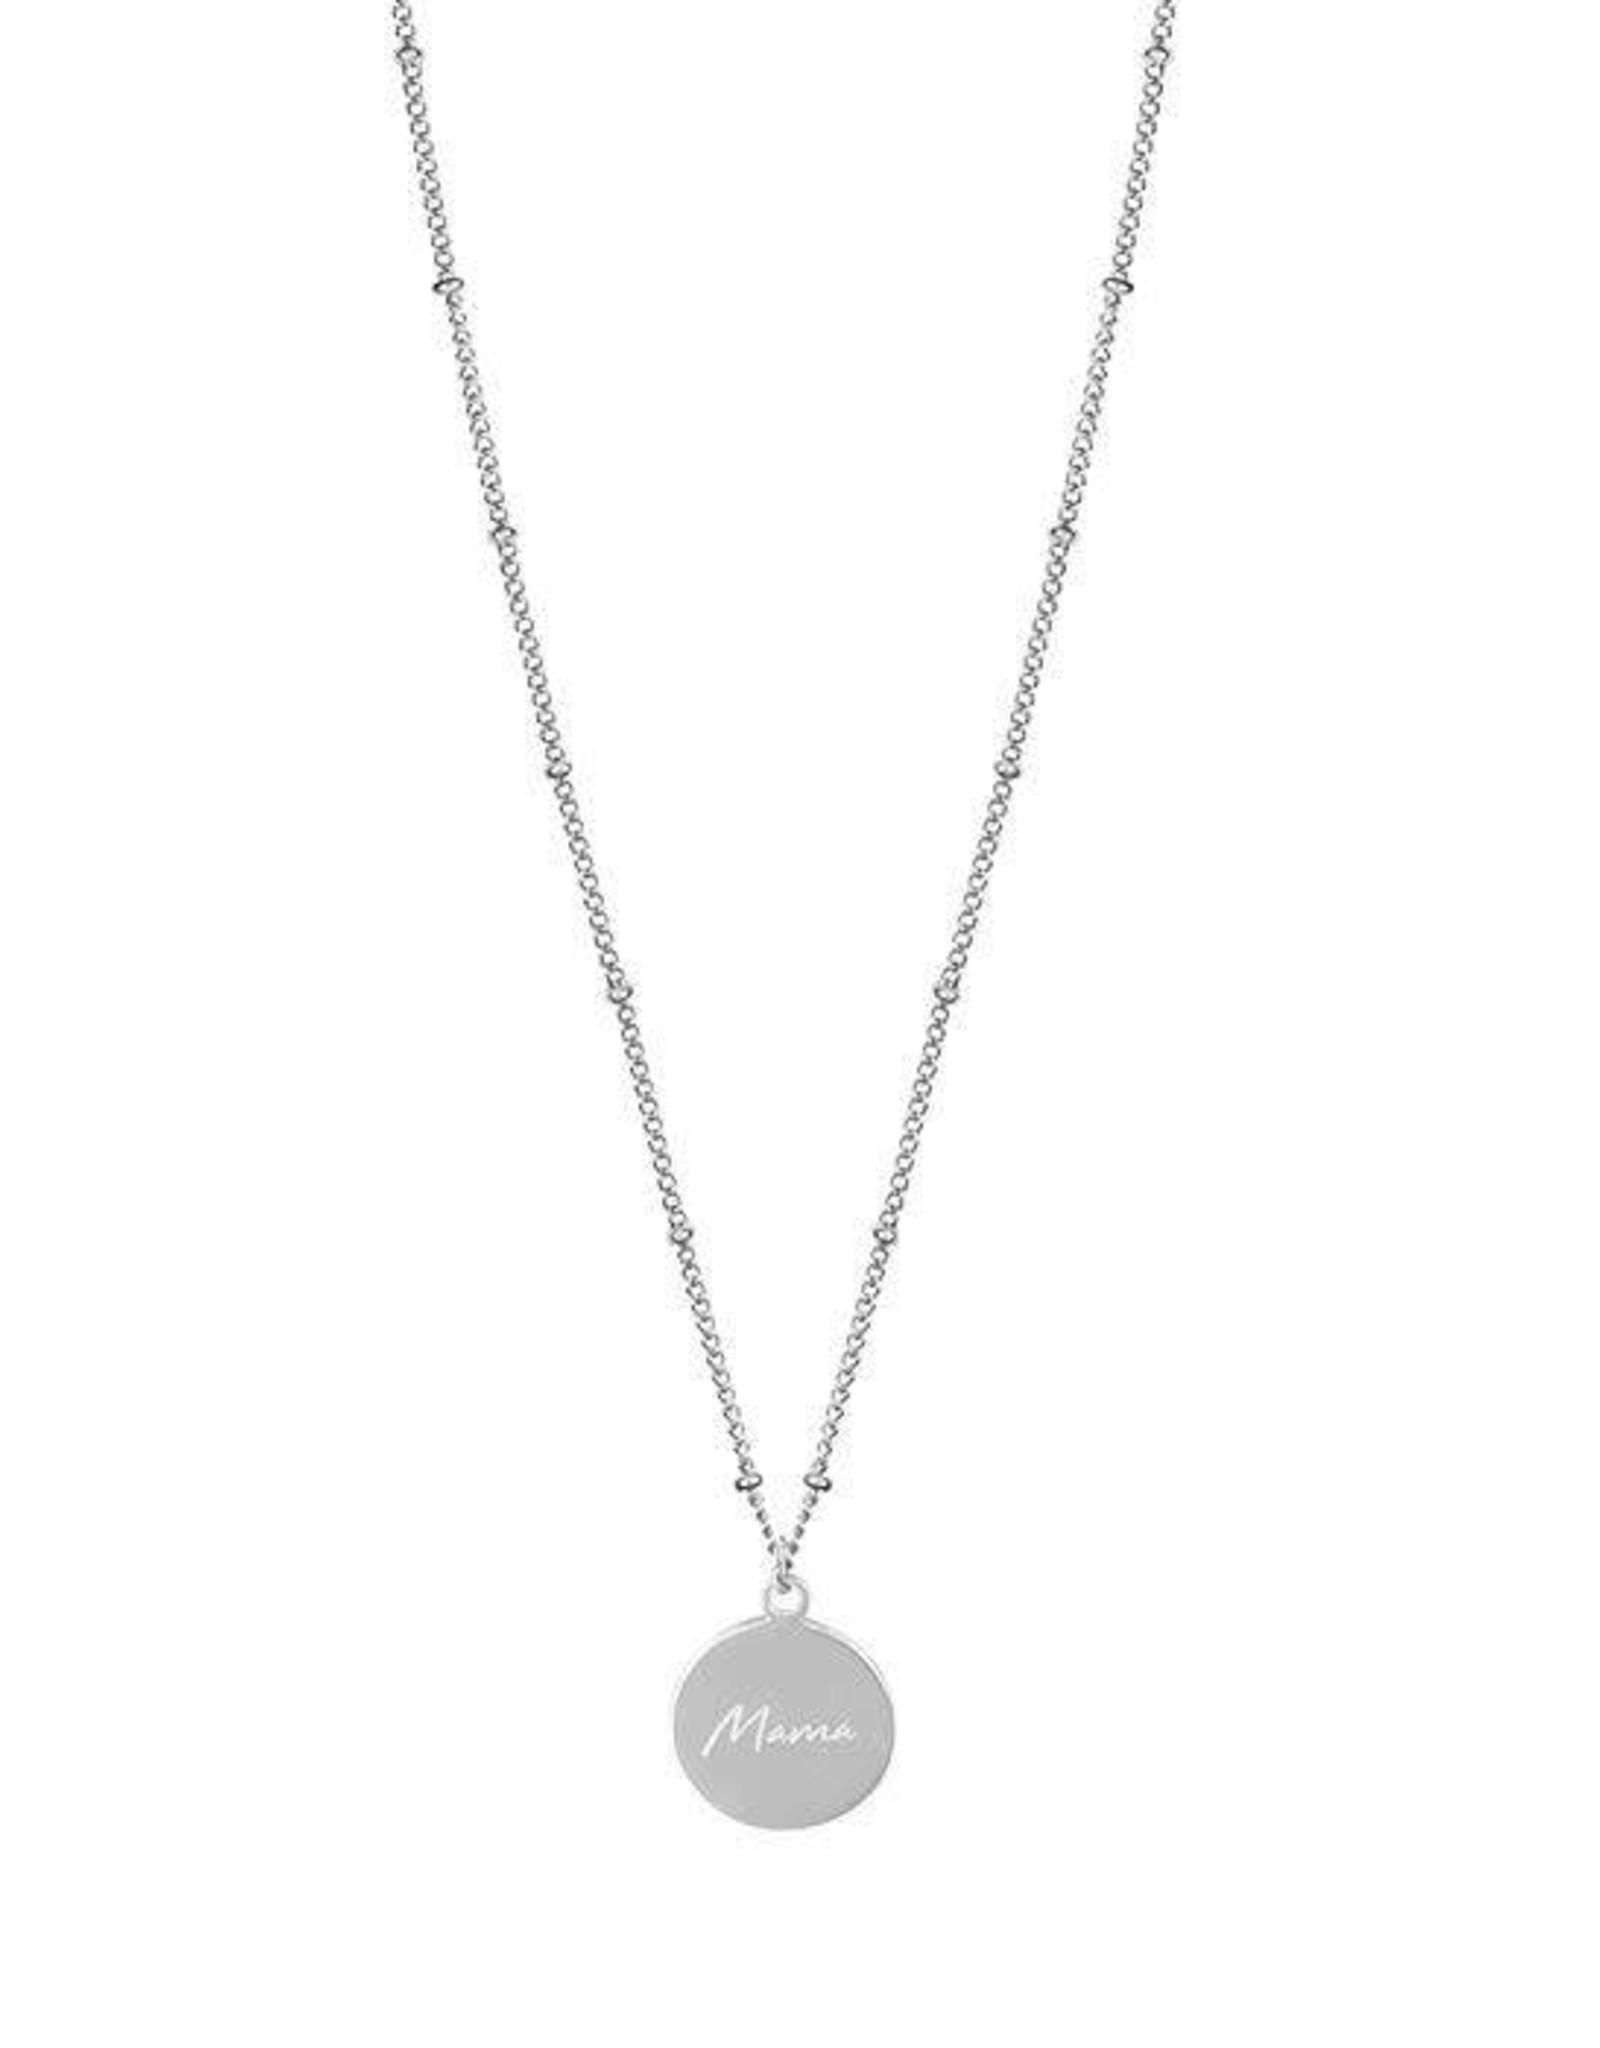 My Jewelry Ketting dots charm 'Mama'-silver